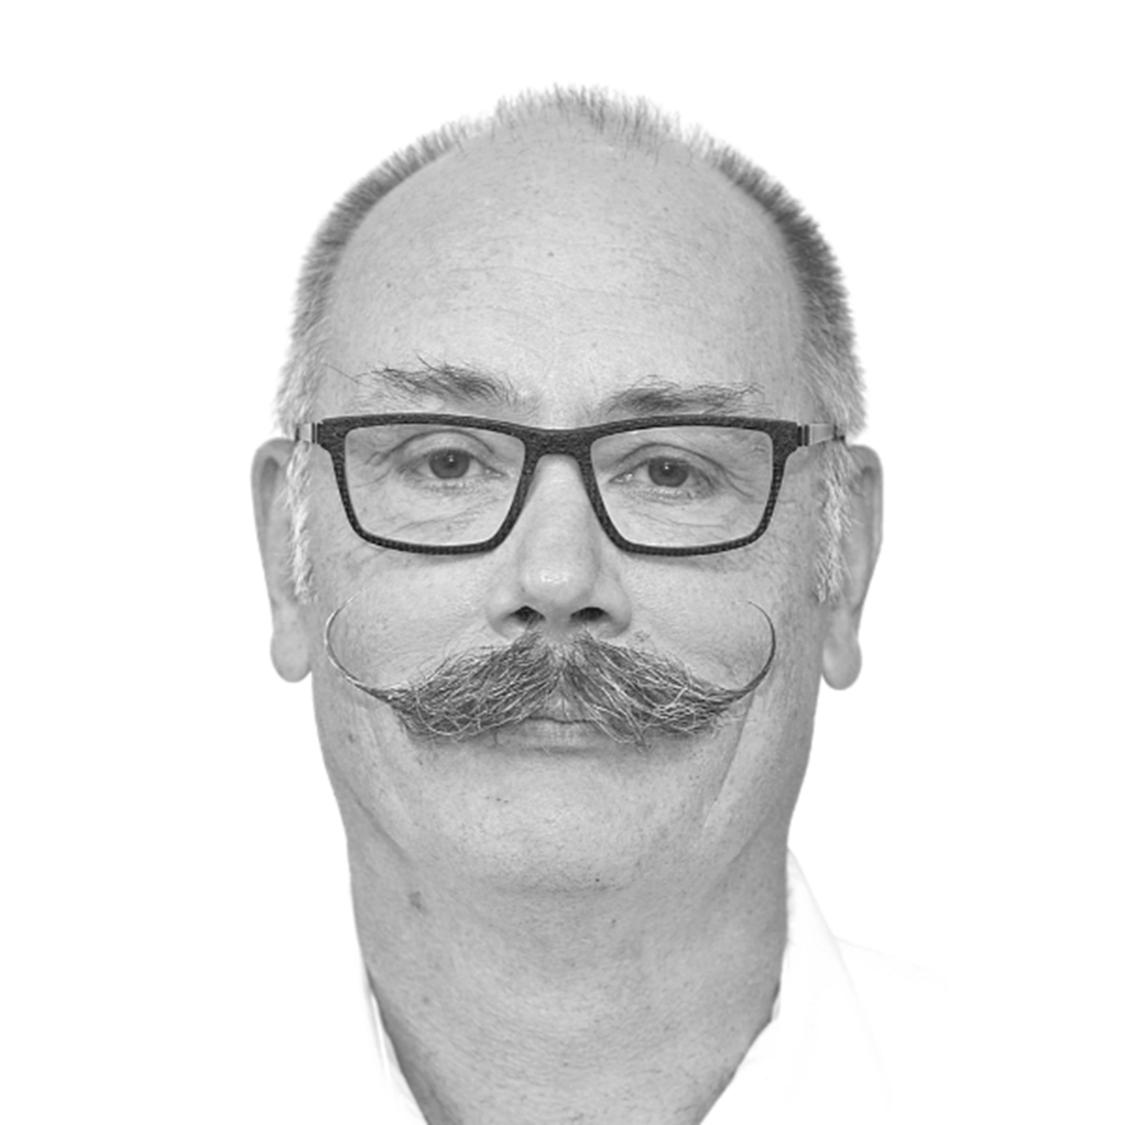 Stefan Käck